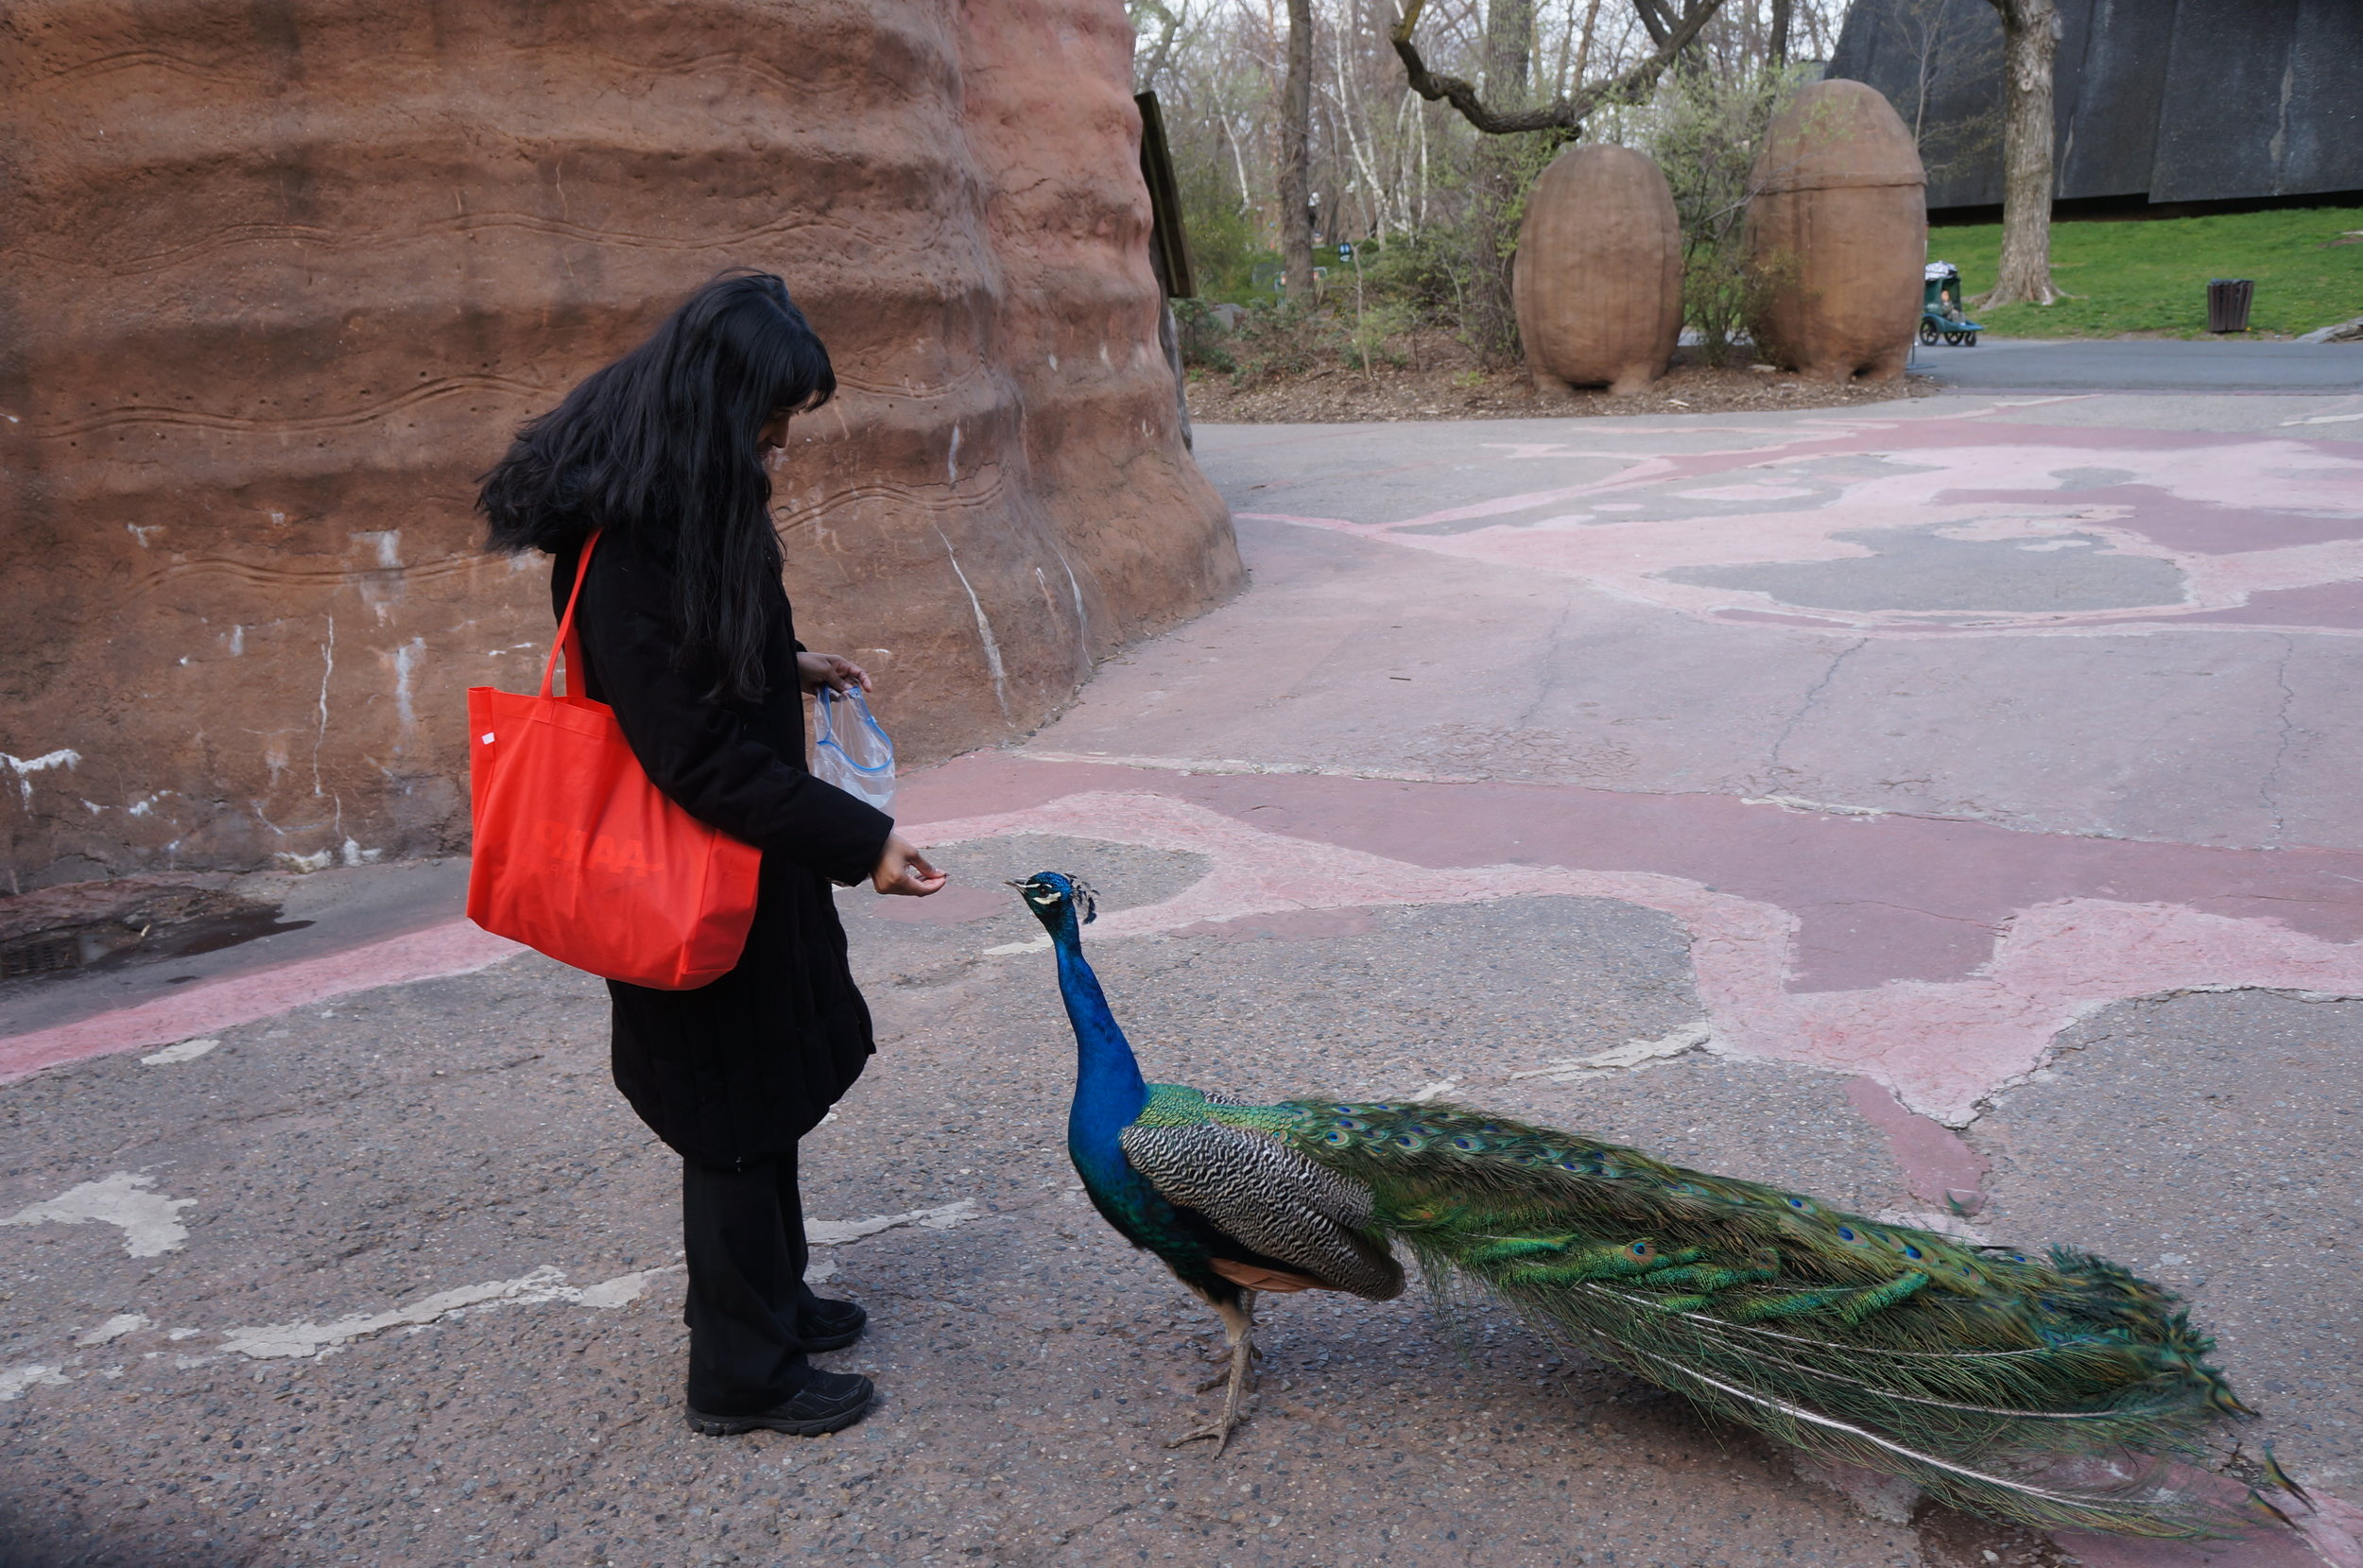 Feeding a Peacock